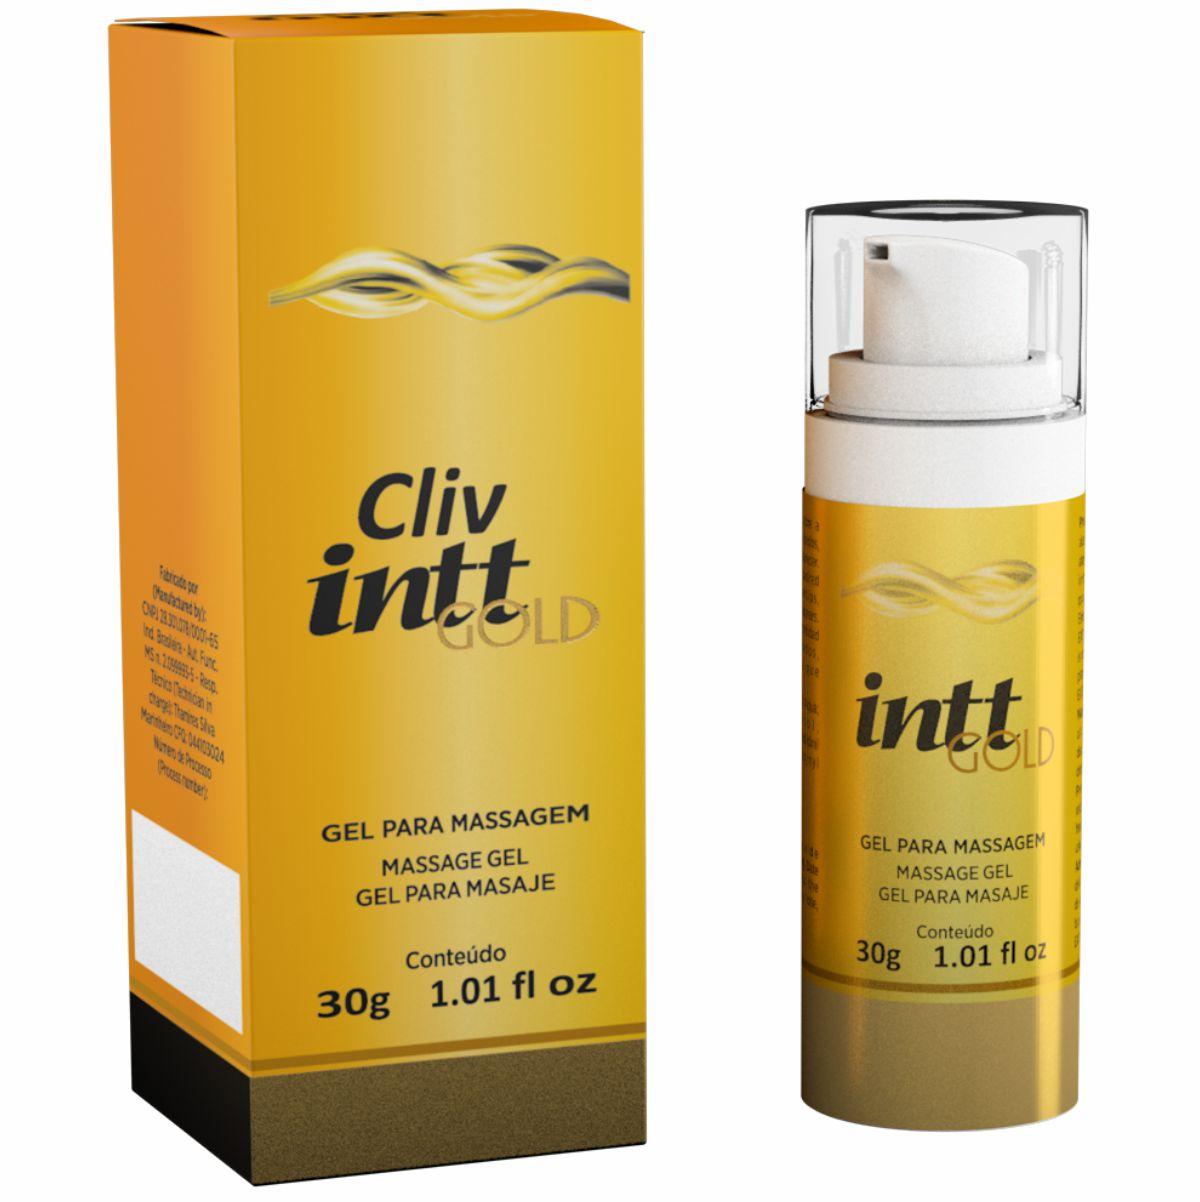 Cliv Intt Gold Gel Dessensibilizante Extra Forte 30g - Intt